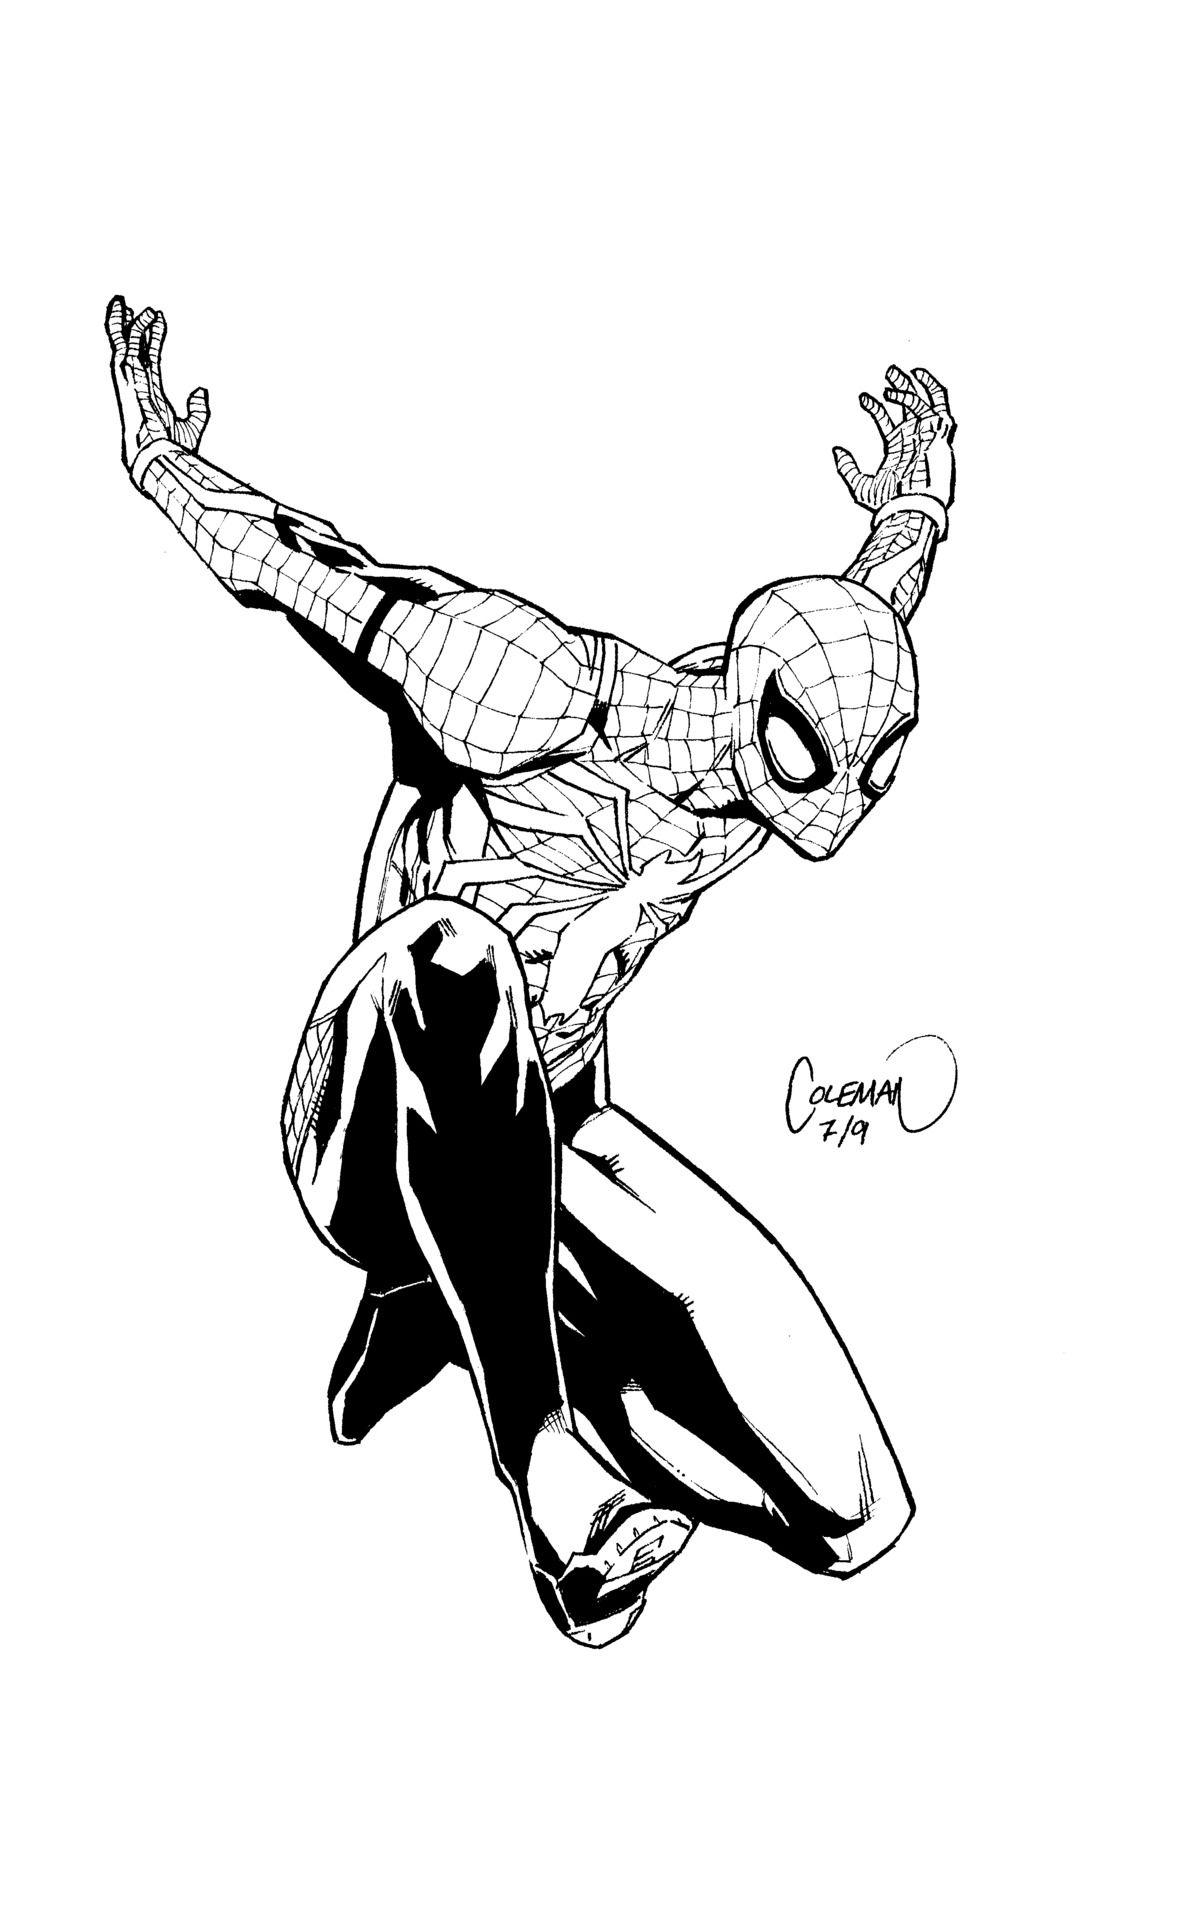 Ruairicoleman Spider Man Ps4 Warm Up Sketch Spiderman Marvel Comics Artists Spiderman Ps4